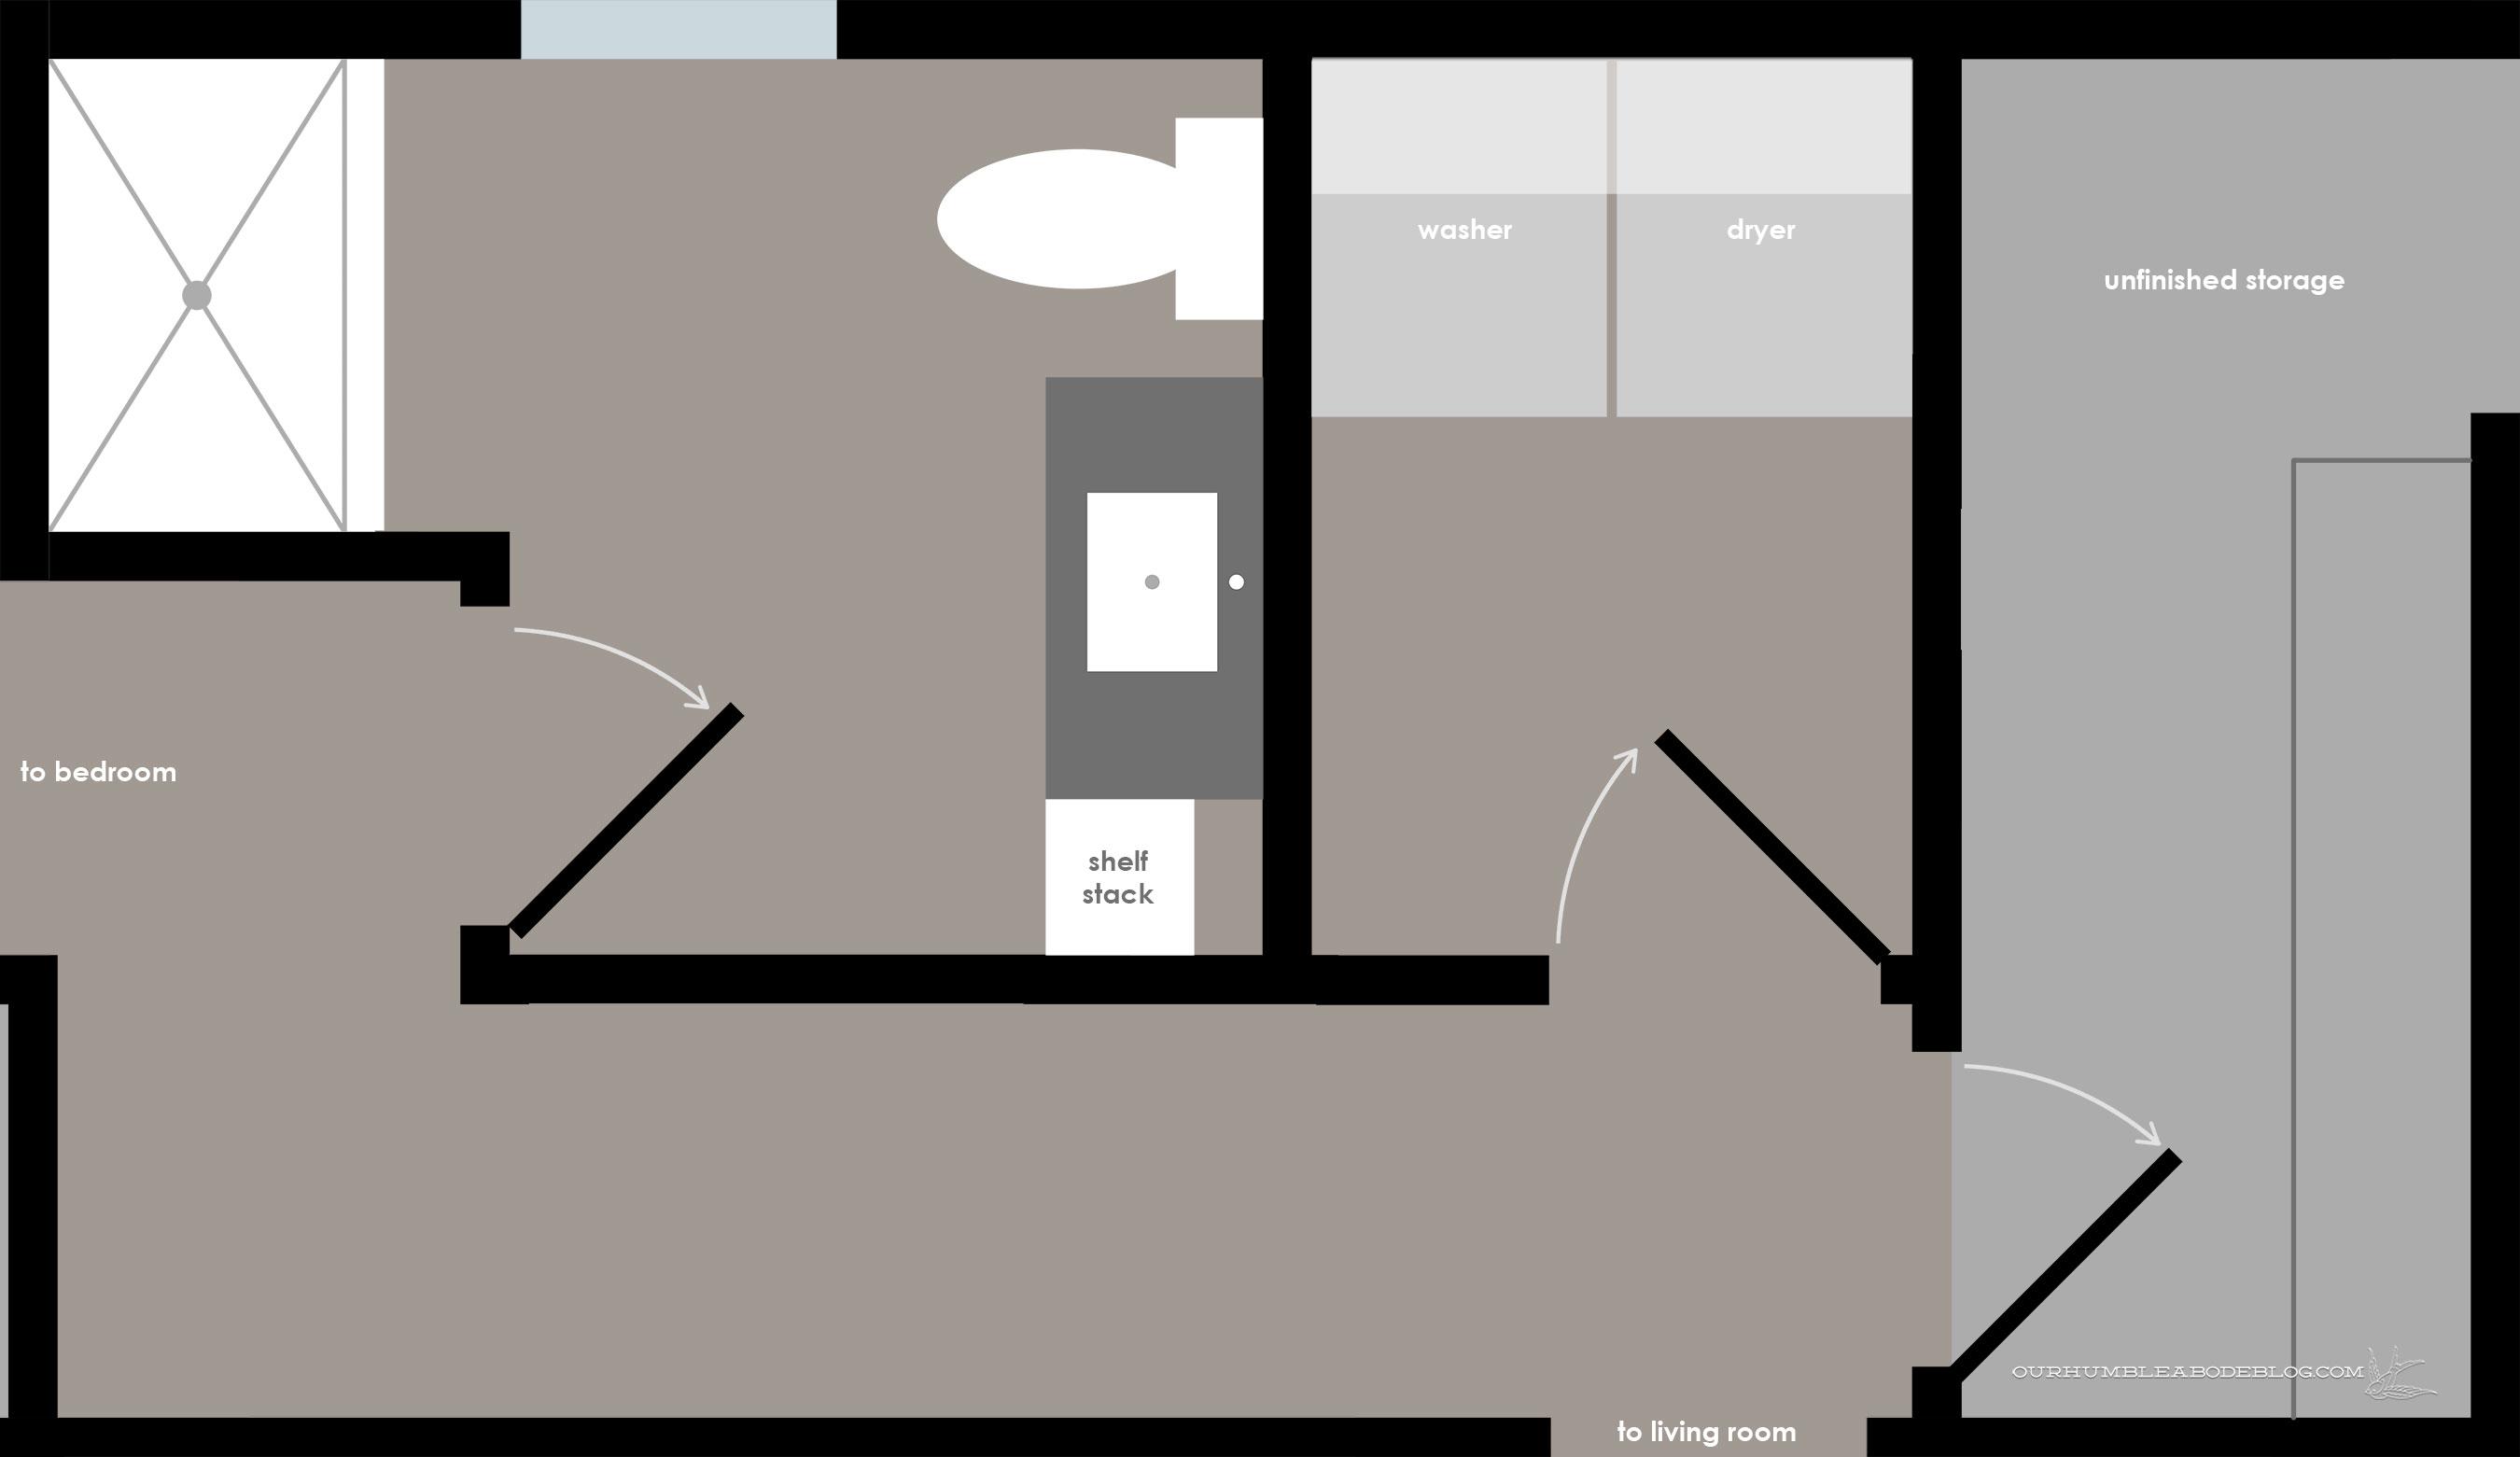 Basement-Bathroom-and-Laundry-Room-Plan